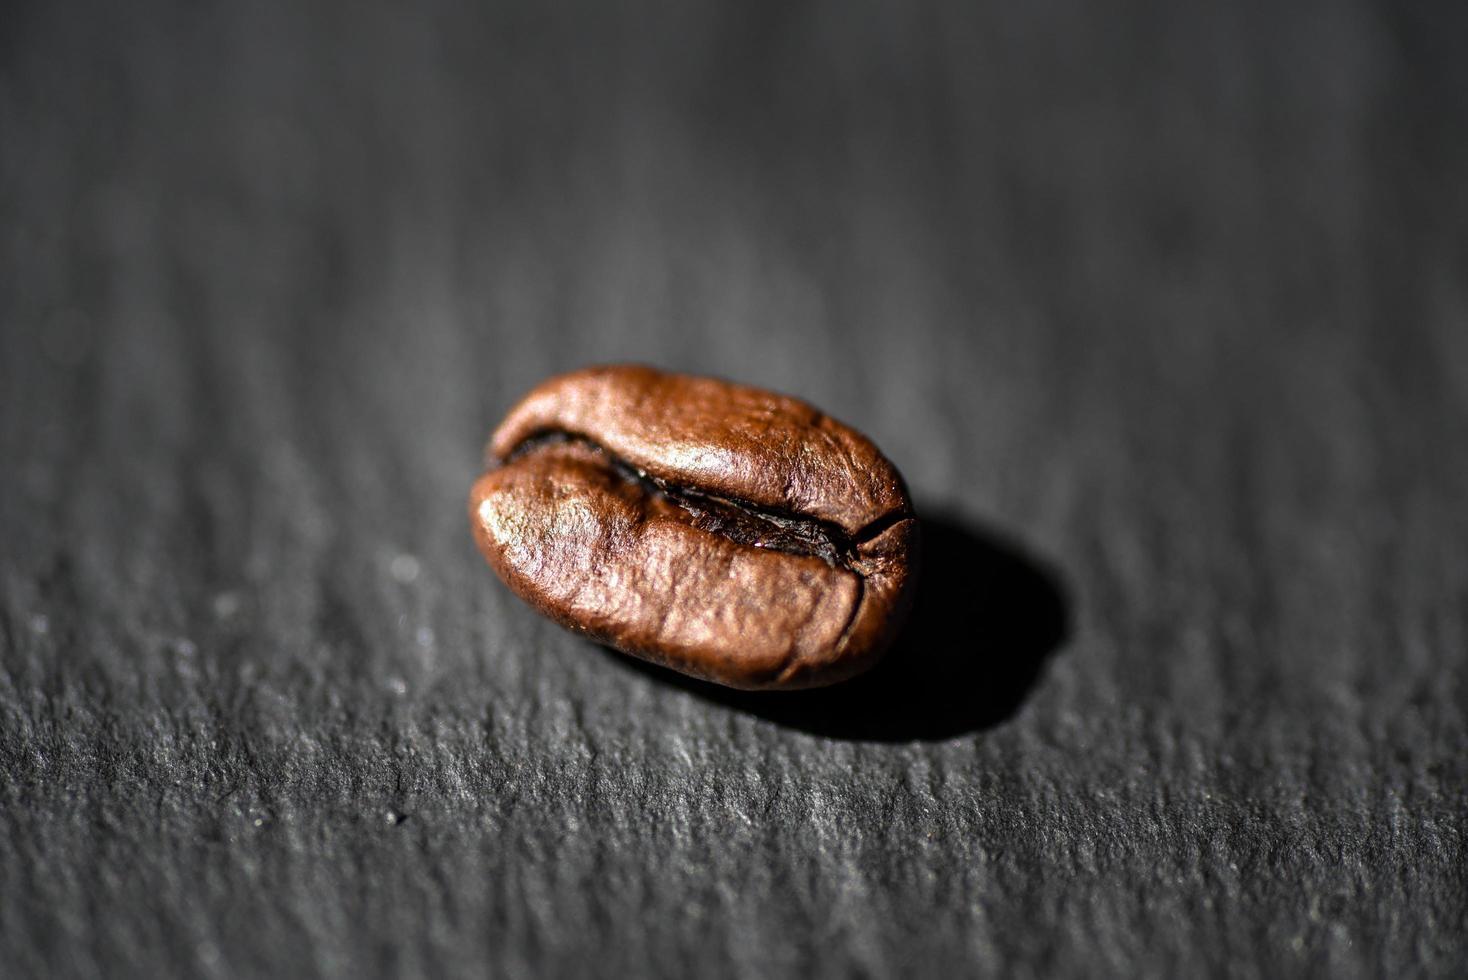 geröstete Kaffeebohne foto